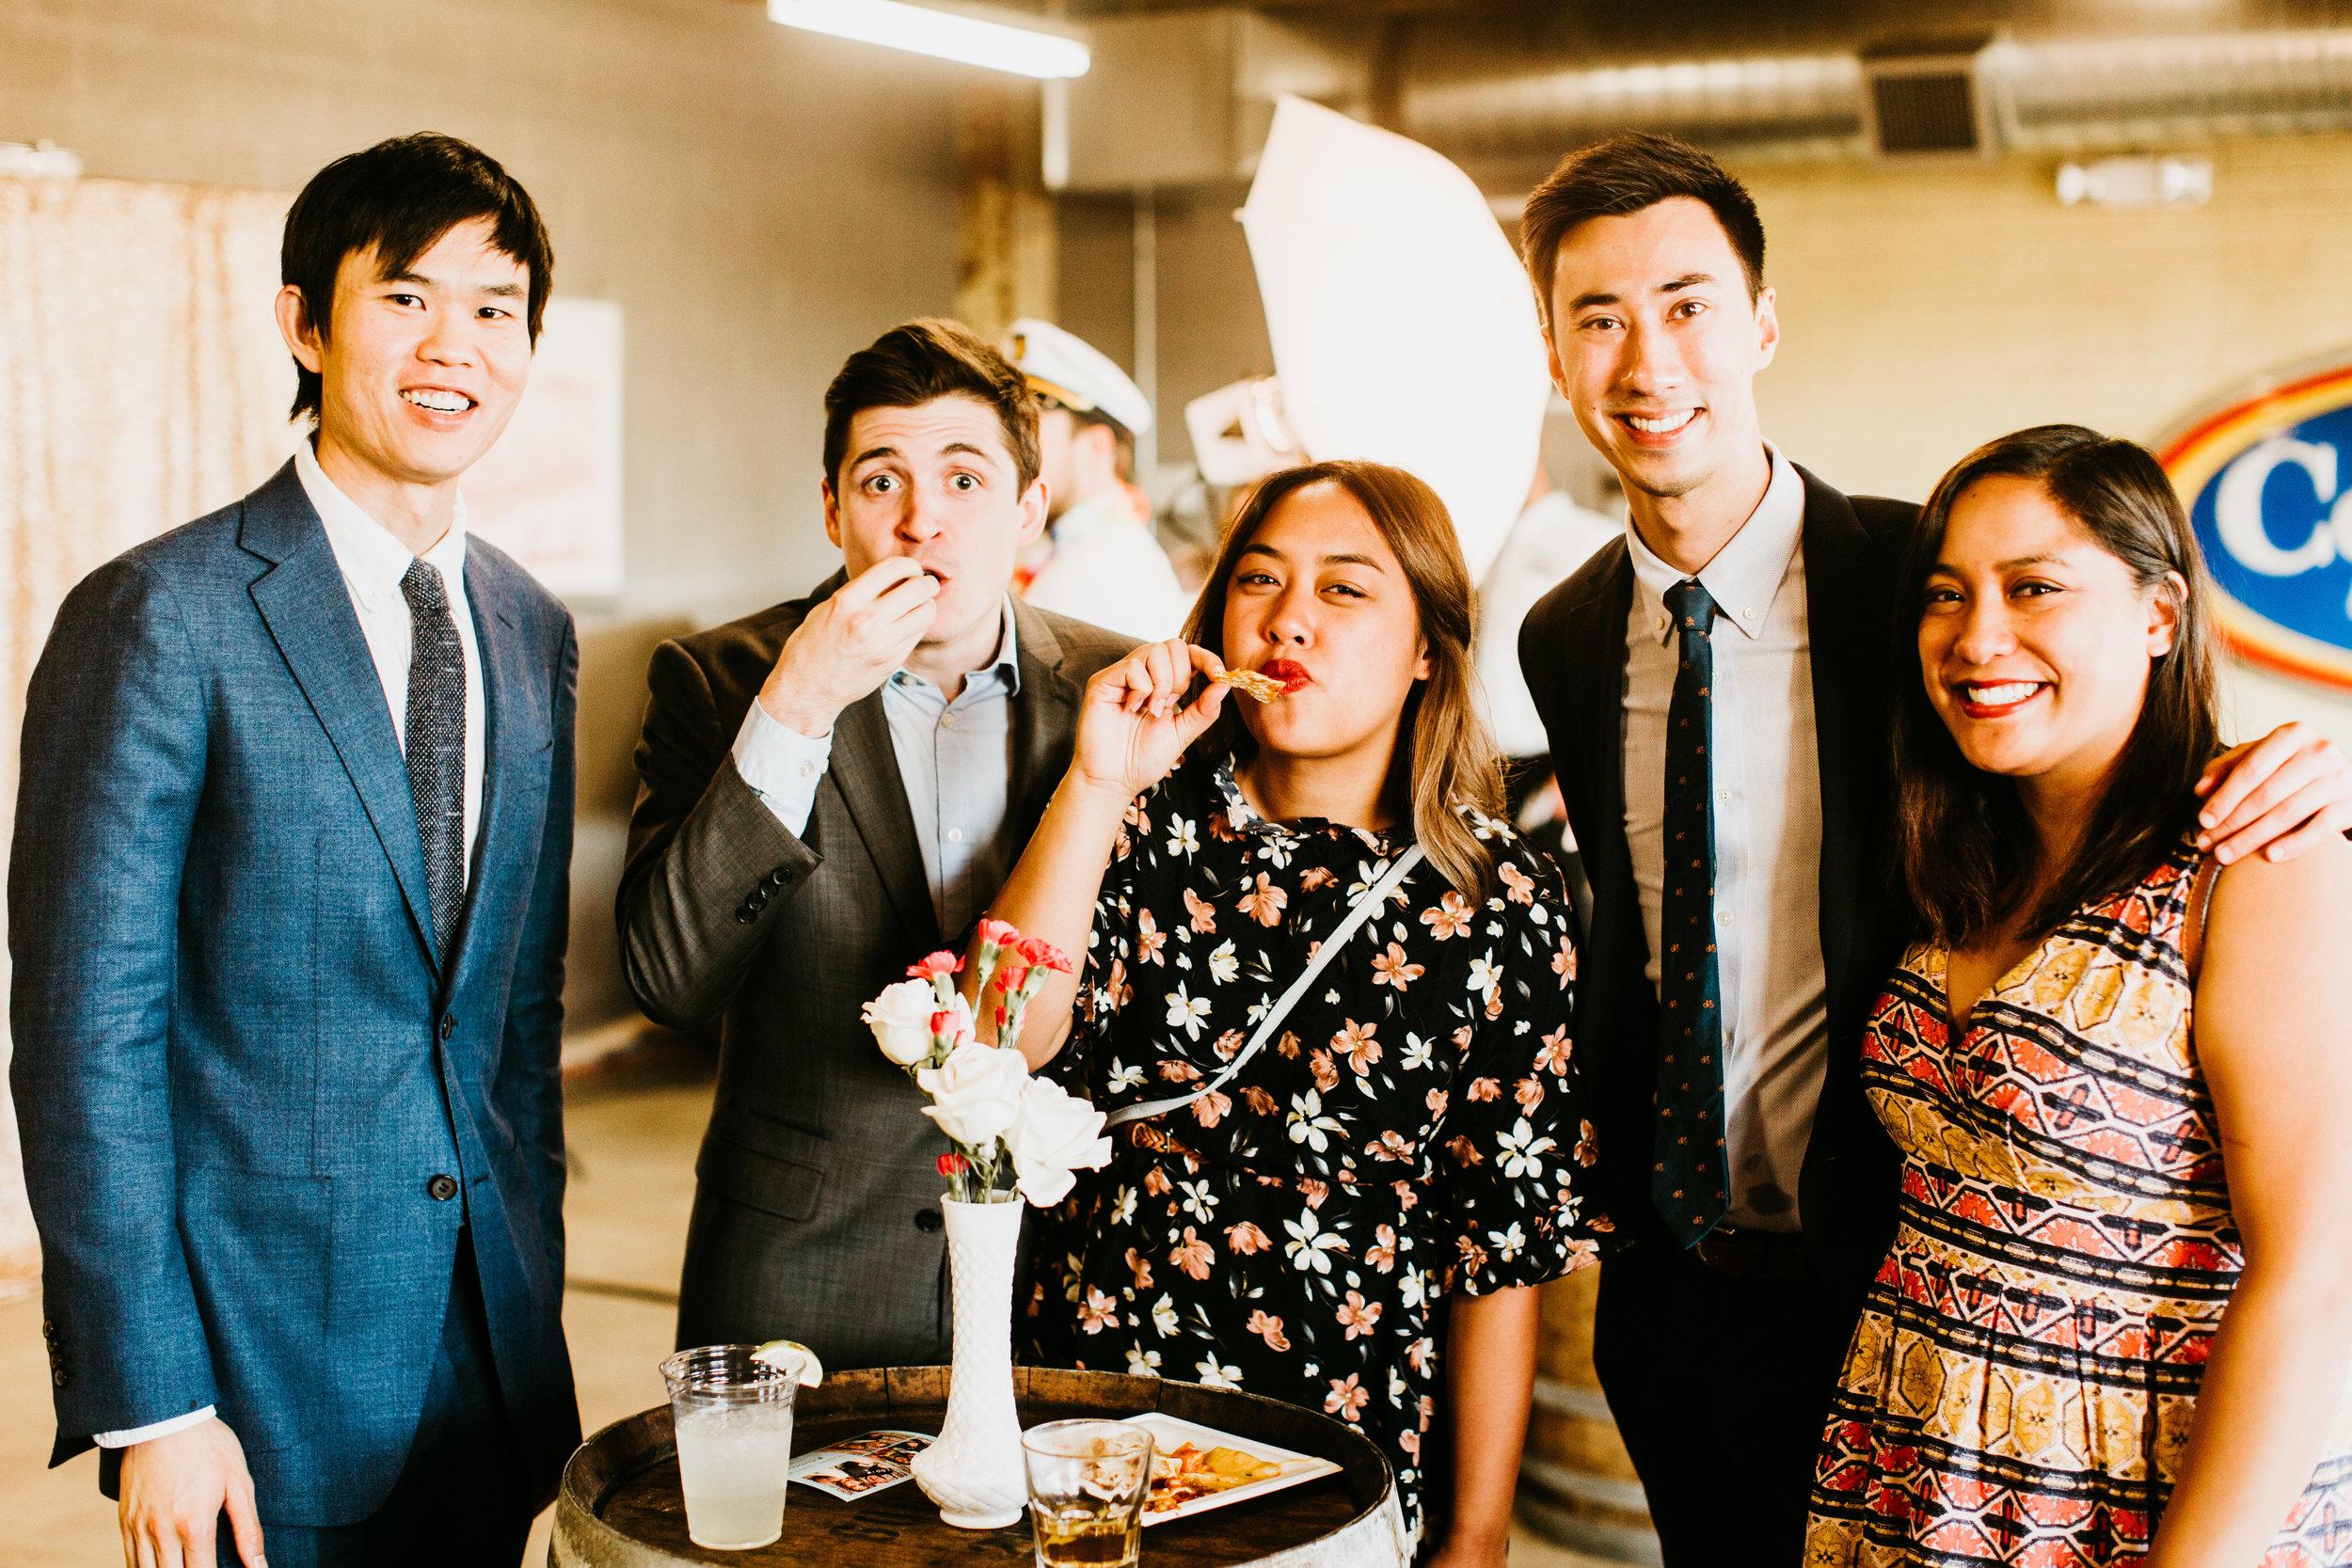 uprooted-traveler-nacho-bar-how-to-have-a-vegan-wedding.jpg